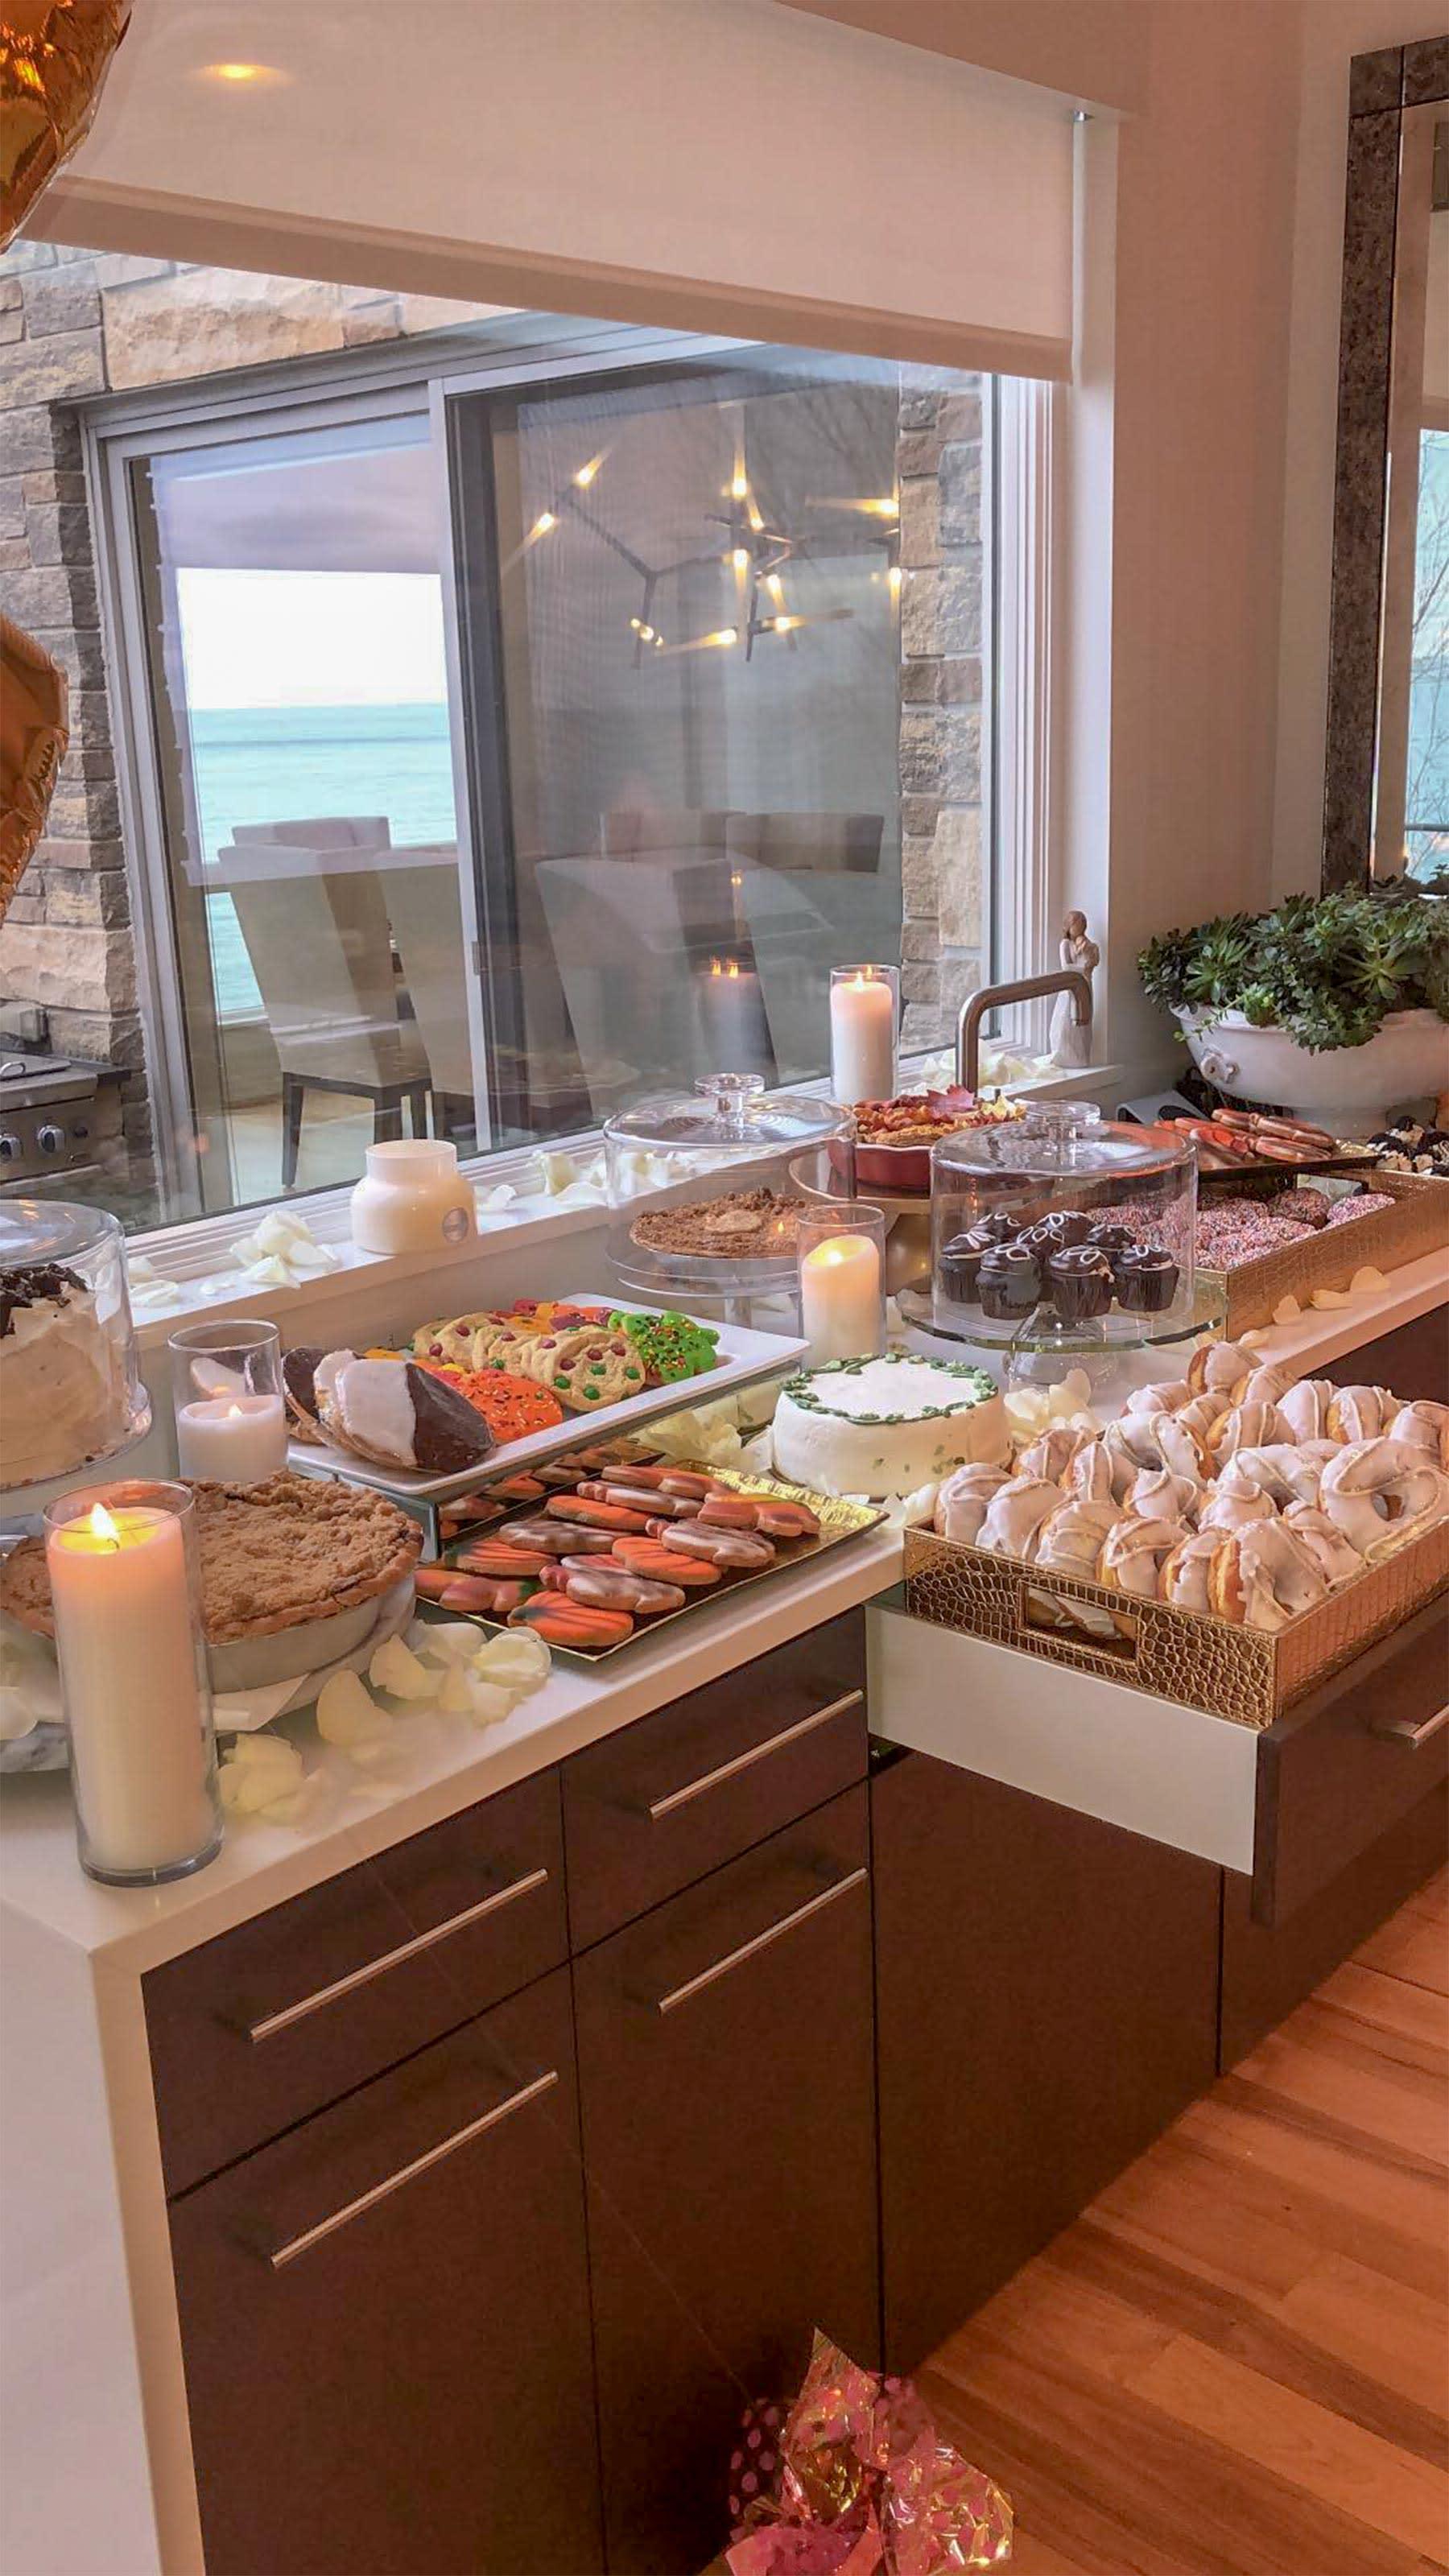 Kardashian Thanksgiving Recipes And Decorating Tips: Khloé Kardashian Spends Thanksgiving With Tristan Thompson